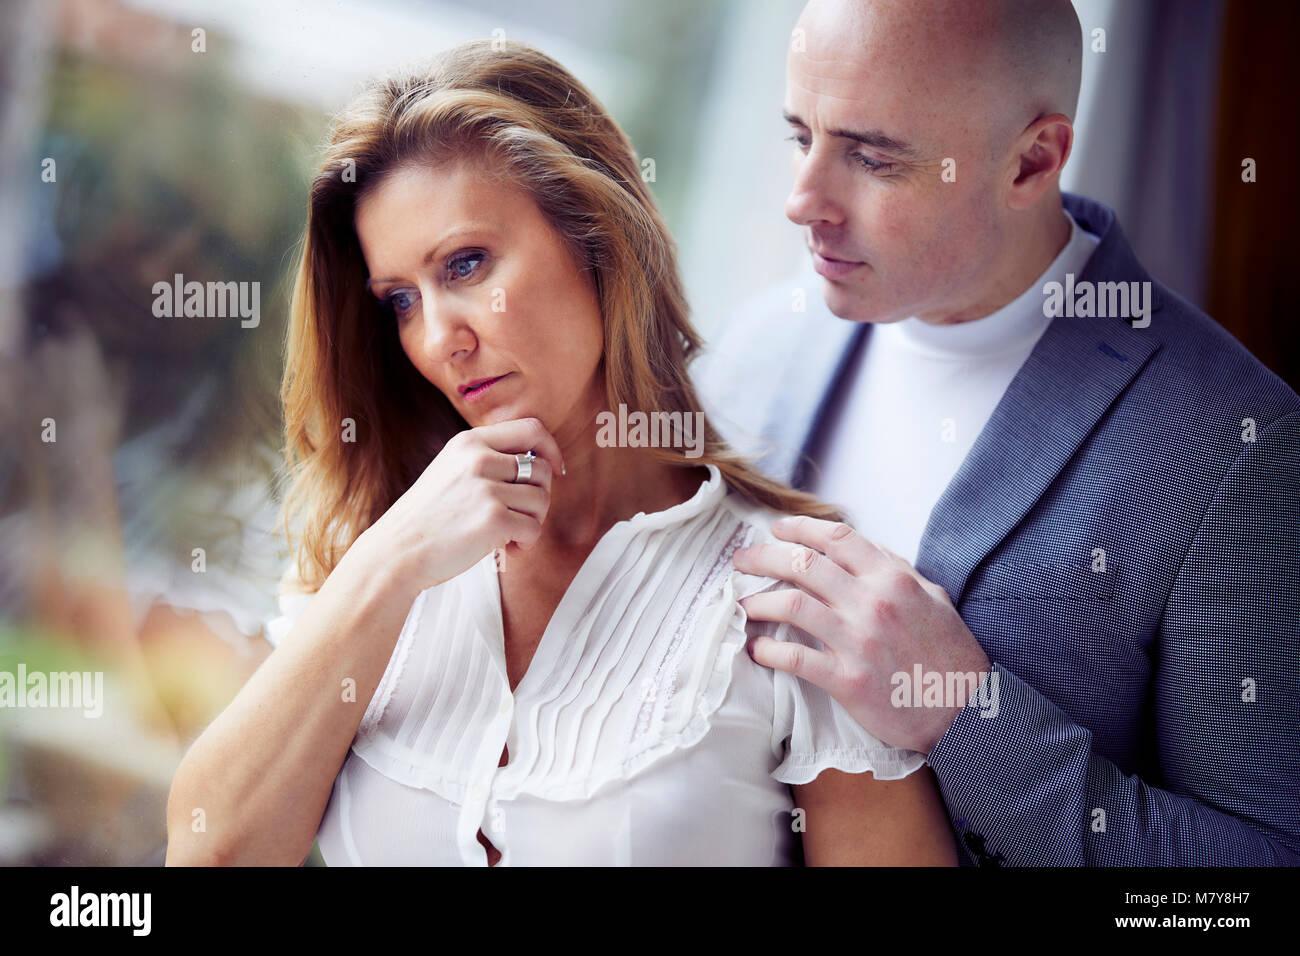 Hombre compañero consoladora Imagen De Stock